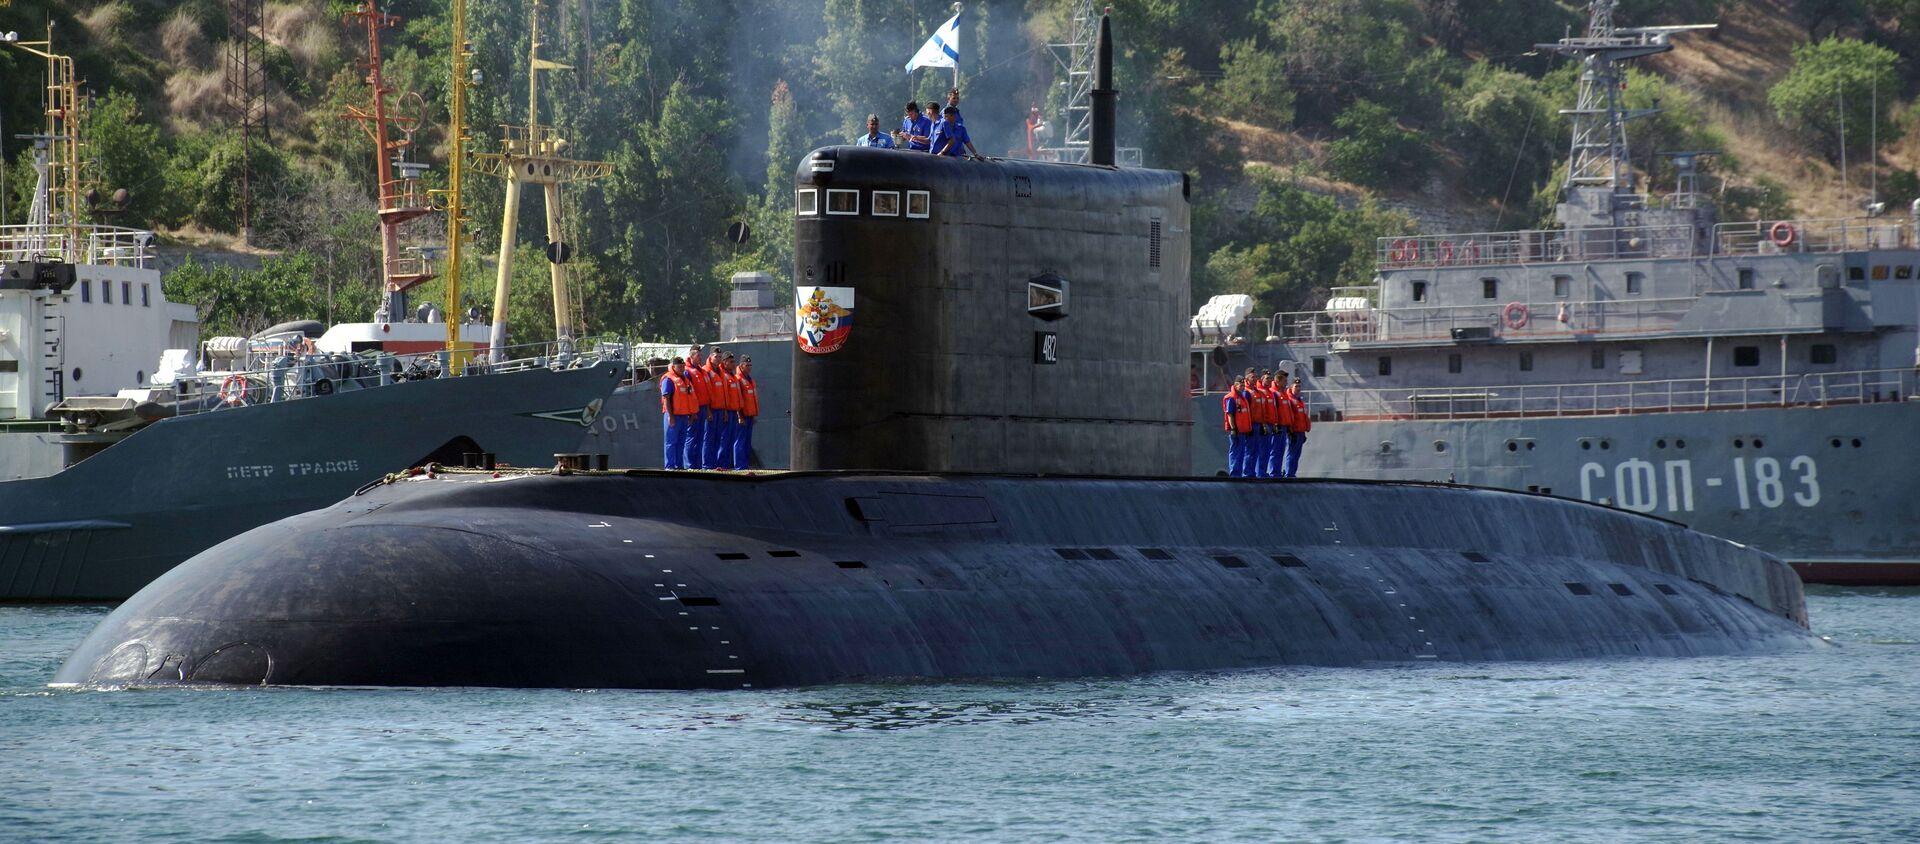 Tàu ngầm Krasnodar của Nga - Sputnik Việt Nam, 1920, 23.07.2020